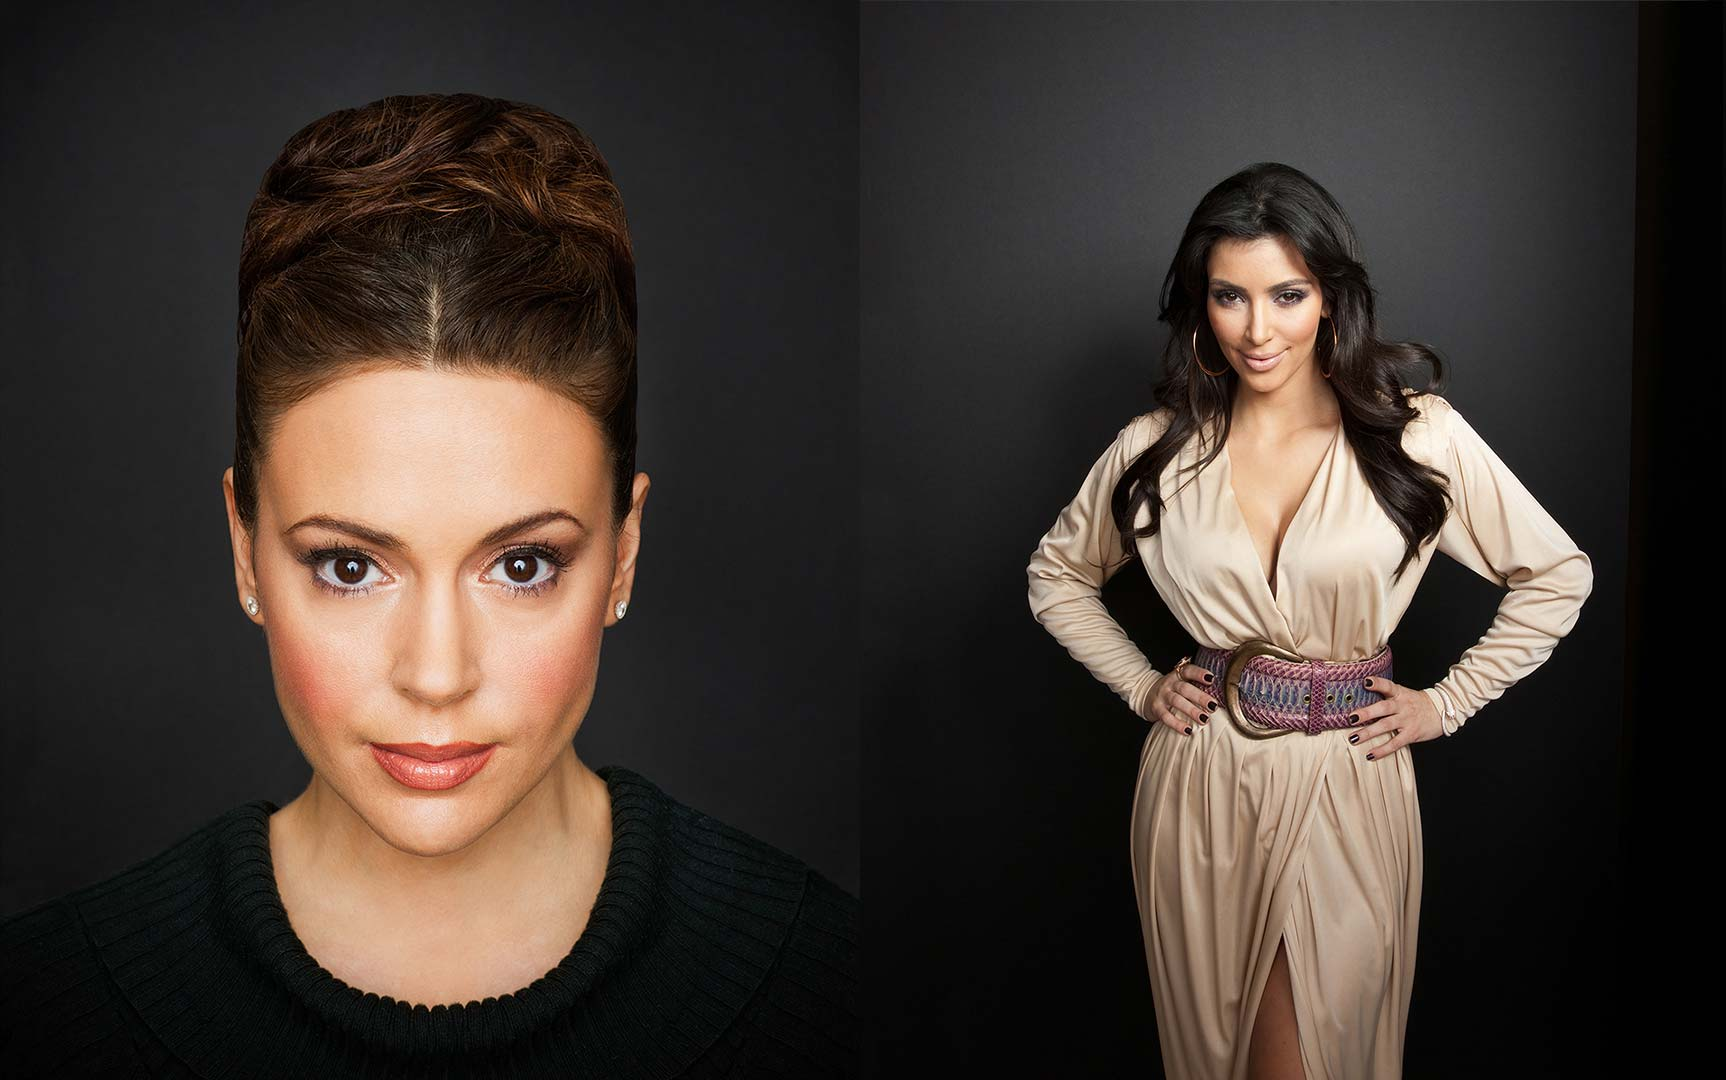 celebrity portrait phoptography of Alyssa Milano and Kim Kardashian